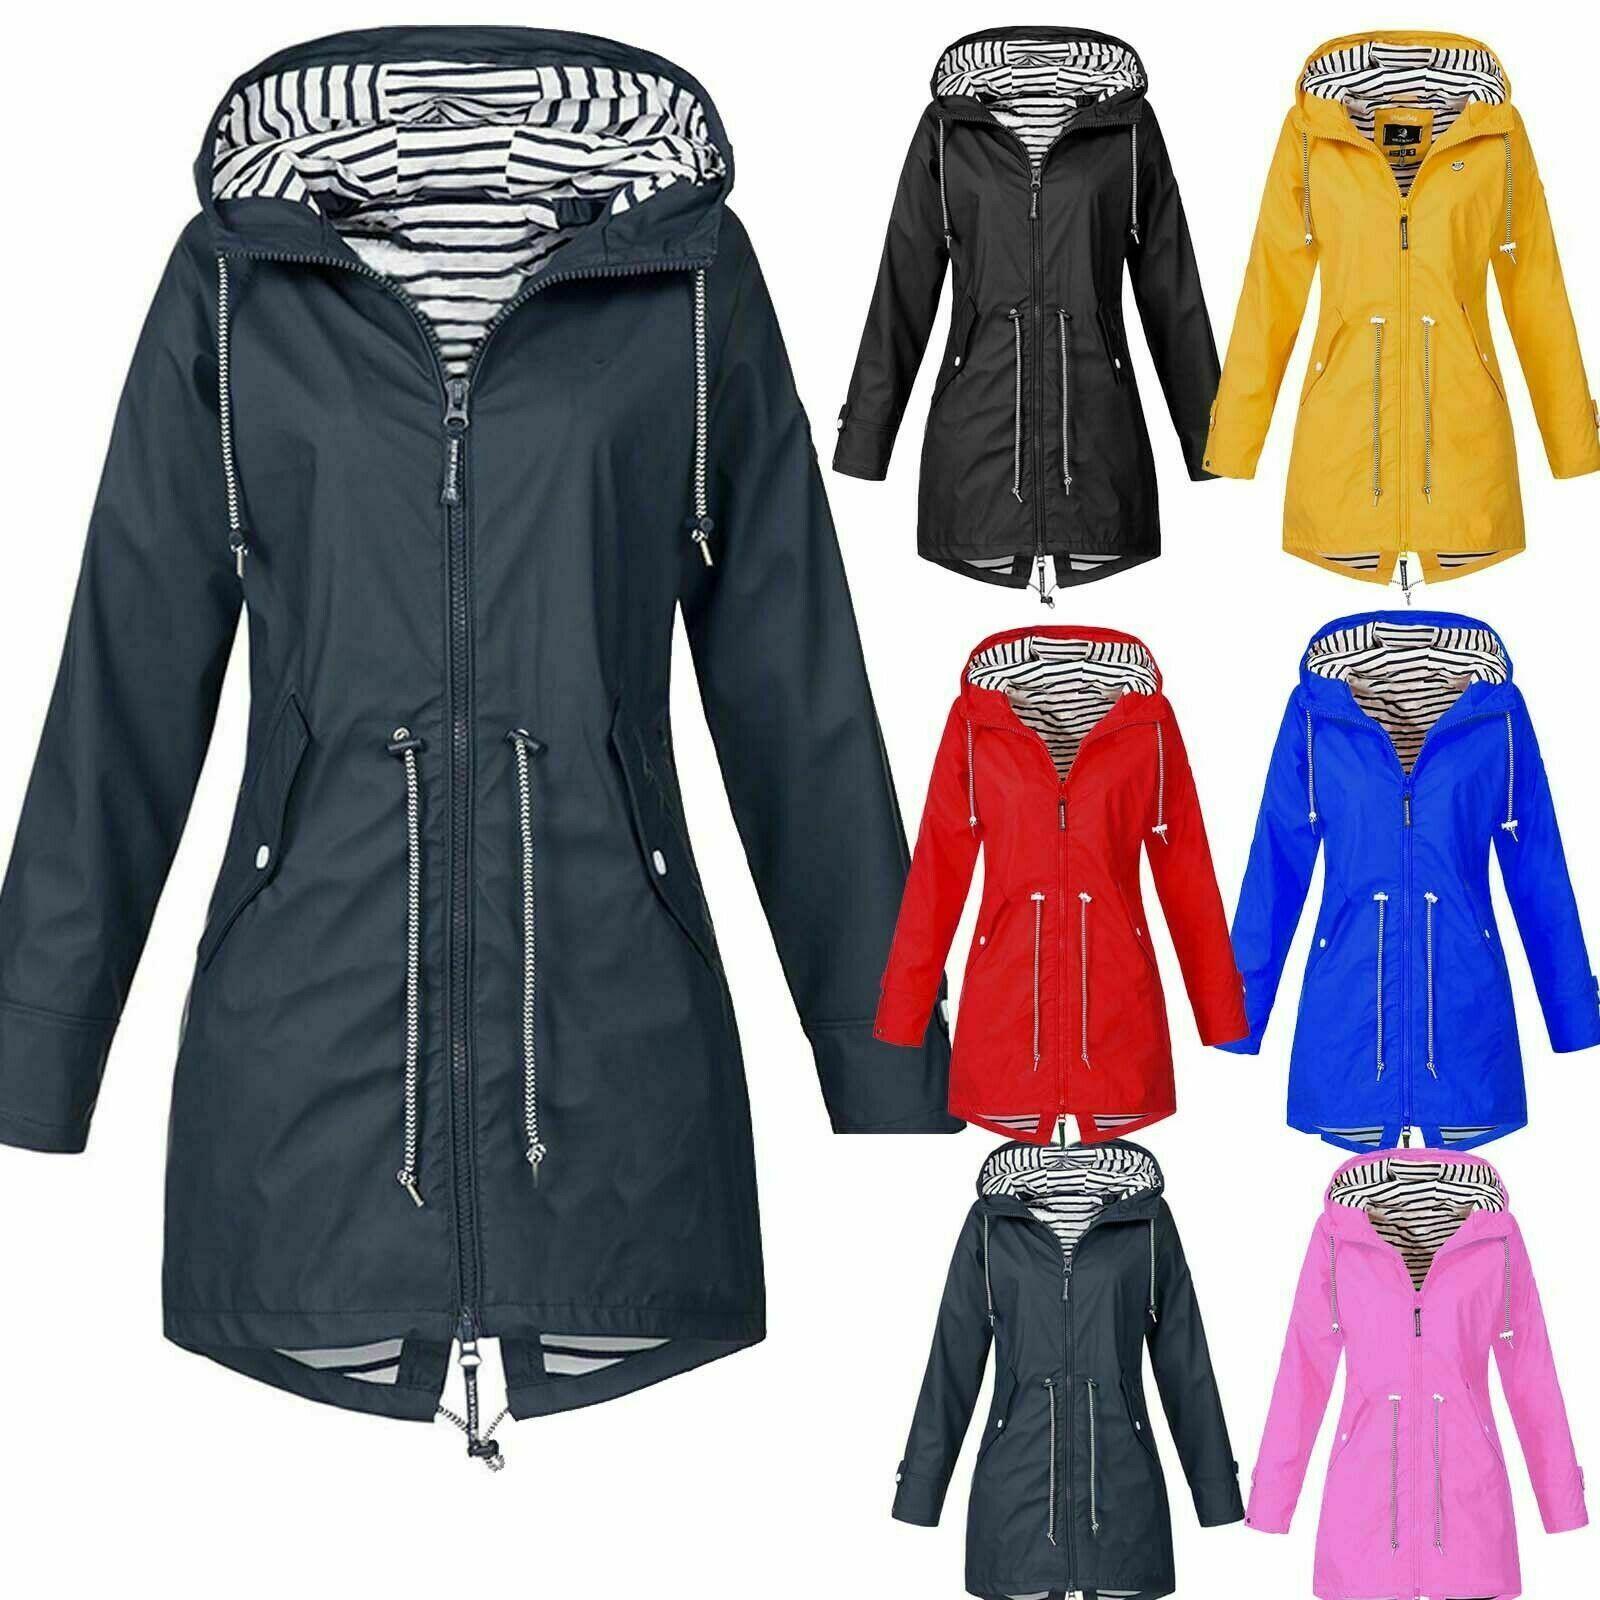 Women Waterproof Raincoat Ladies Outdoor Wind Rain Forest Jacket Coat Size LOT